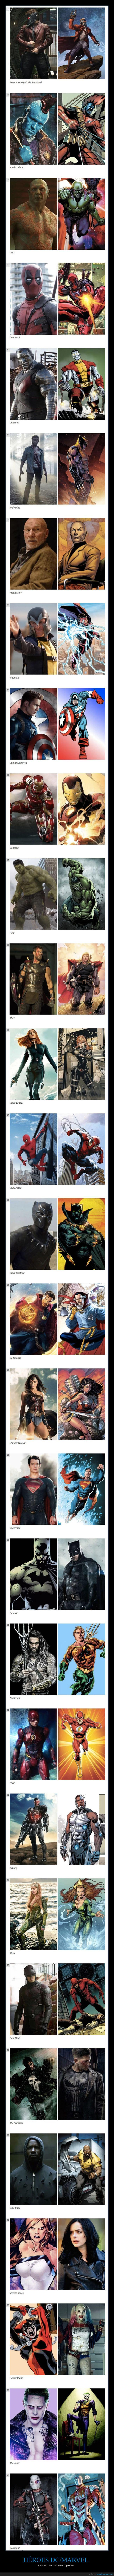 cine,comics,héroes,marvel,películas,superhéroes,tv